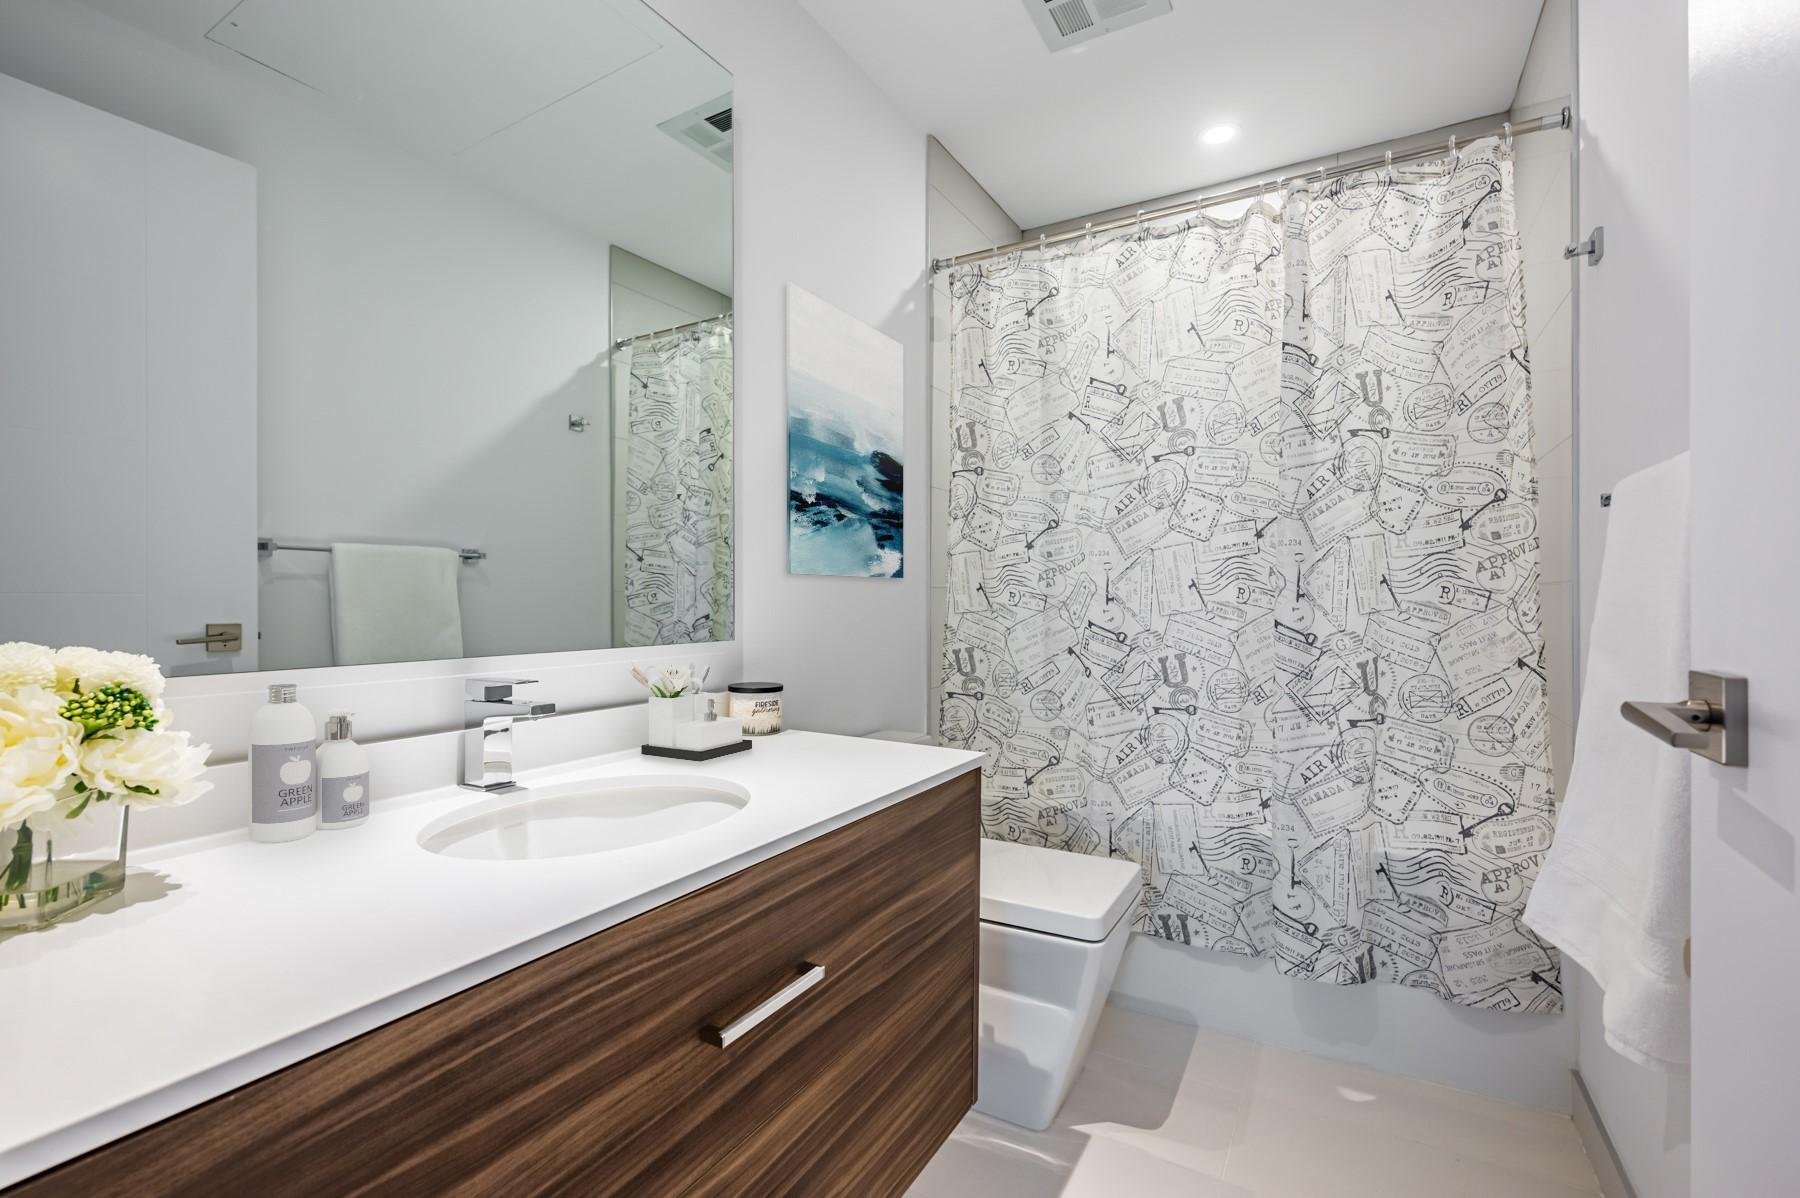 4-piece washroom quartz counter and gray and white colours.